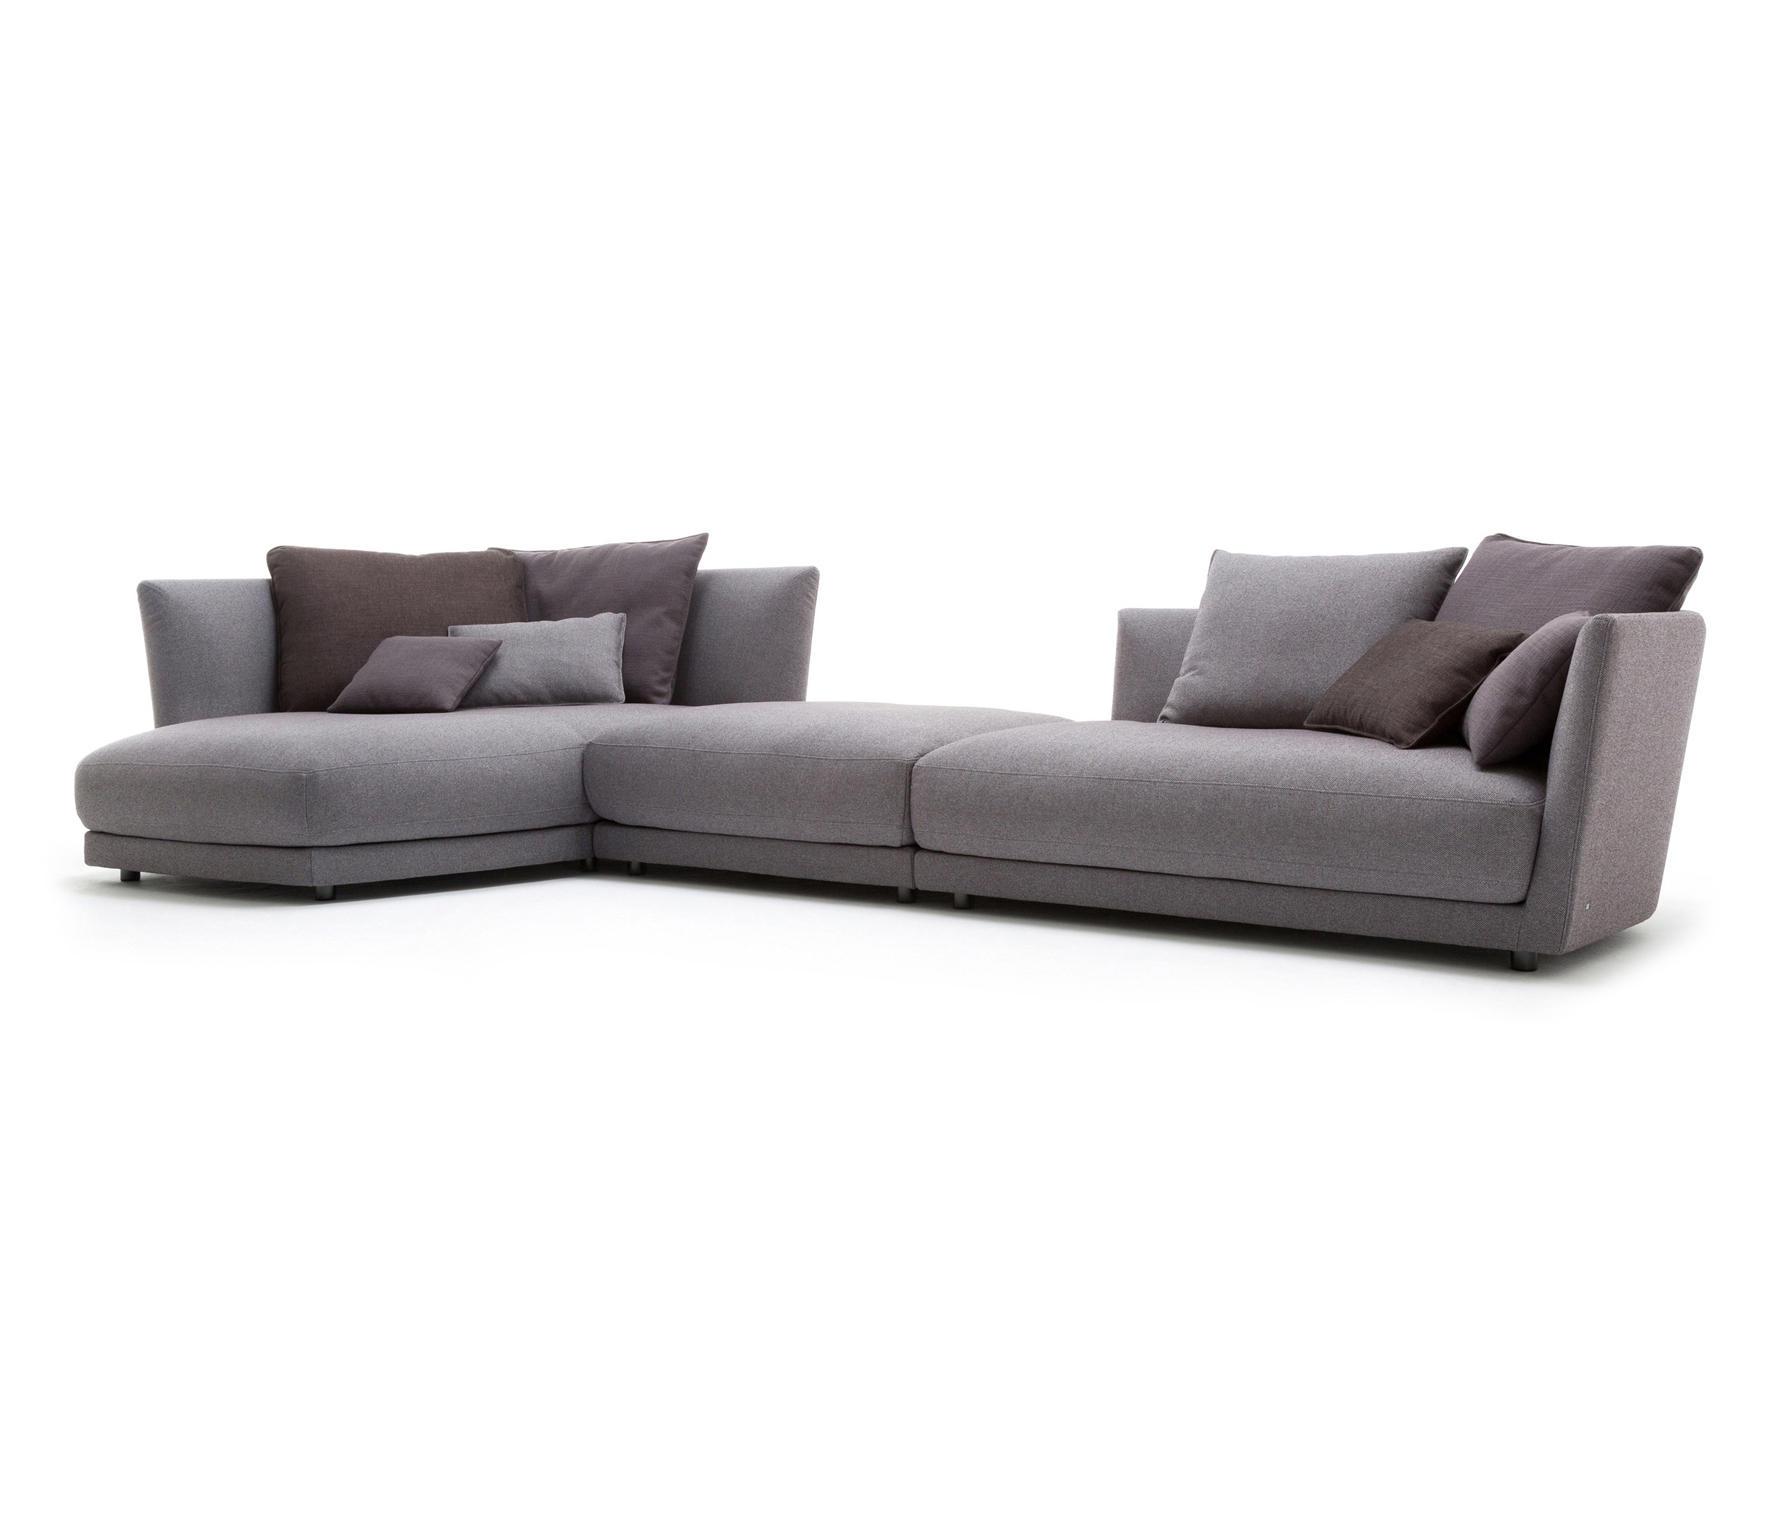 rolf benz tondo modular sofa systems from rolf benz. Black Bedroom Furniture Sets. Home Design Ideas